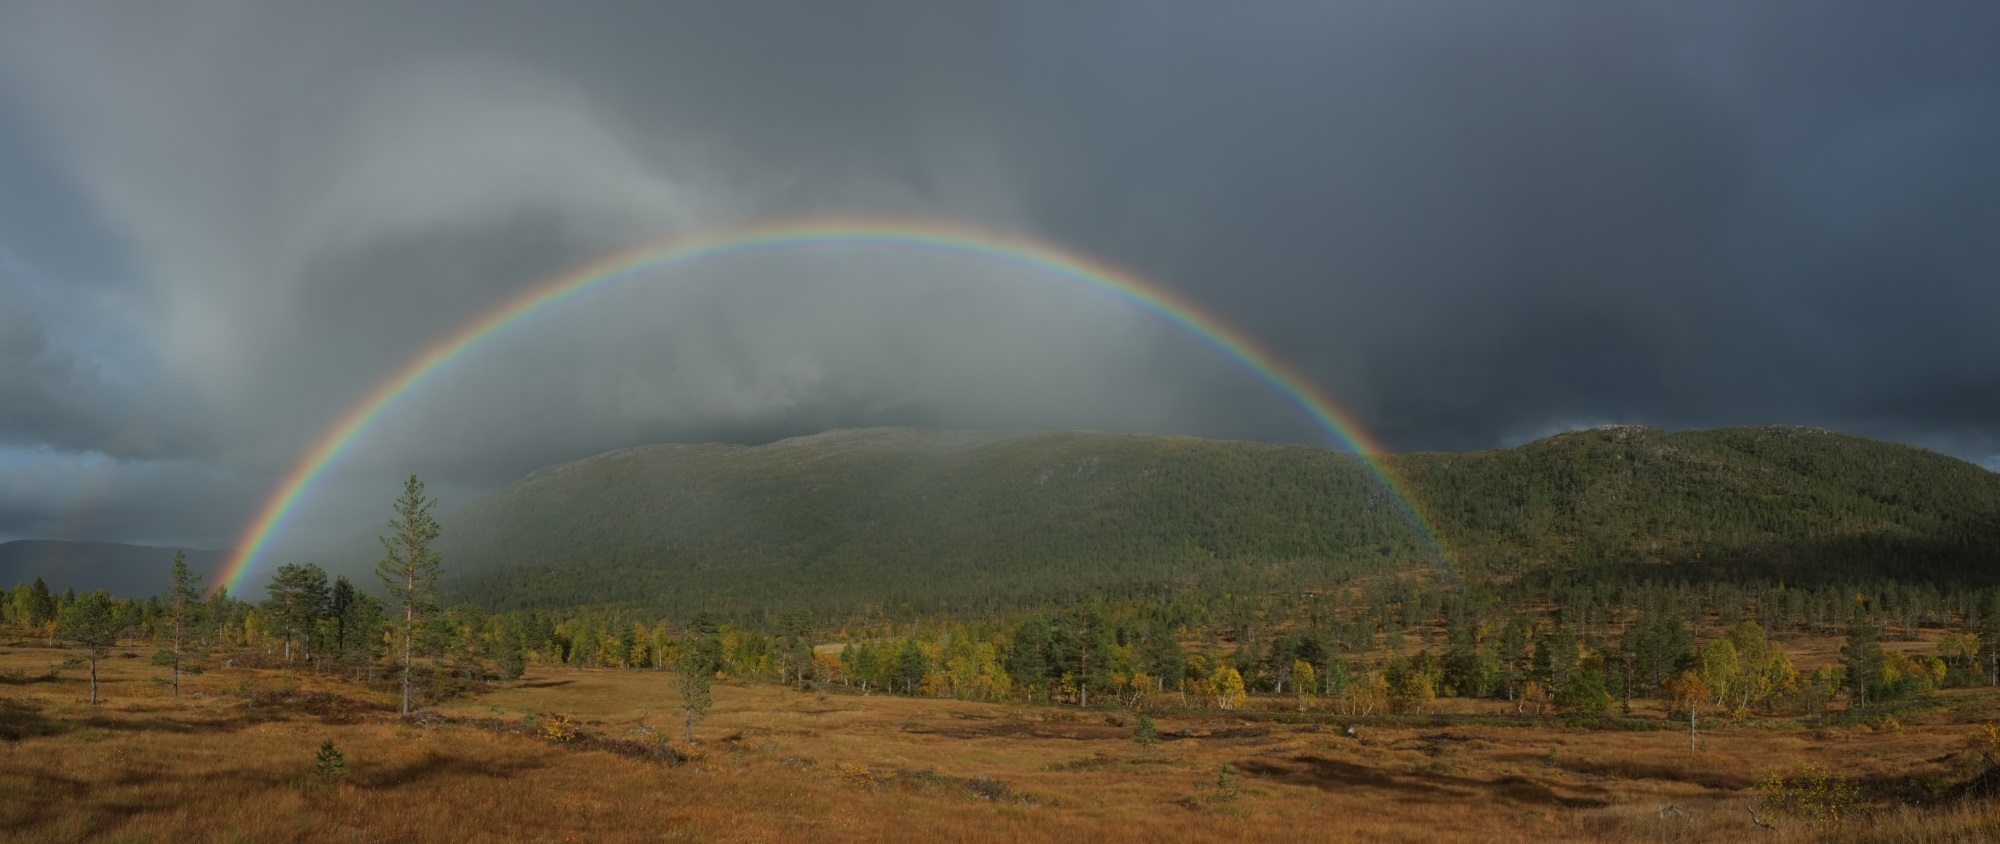 Flott regnbue ved Langøya, september 2015. Fotograf: Daniel Zwick